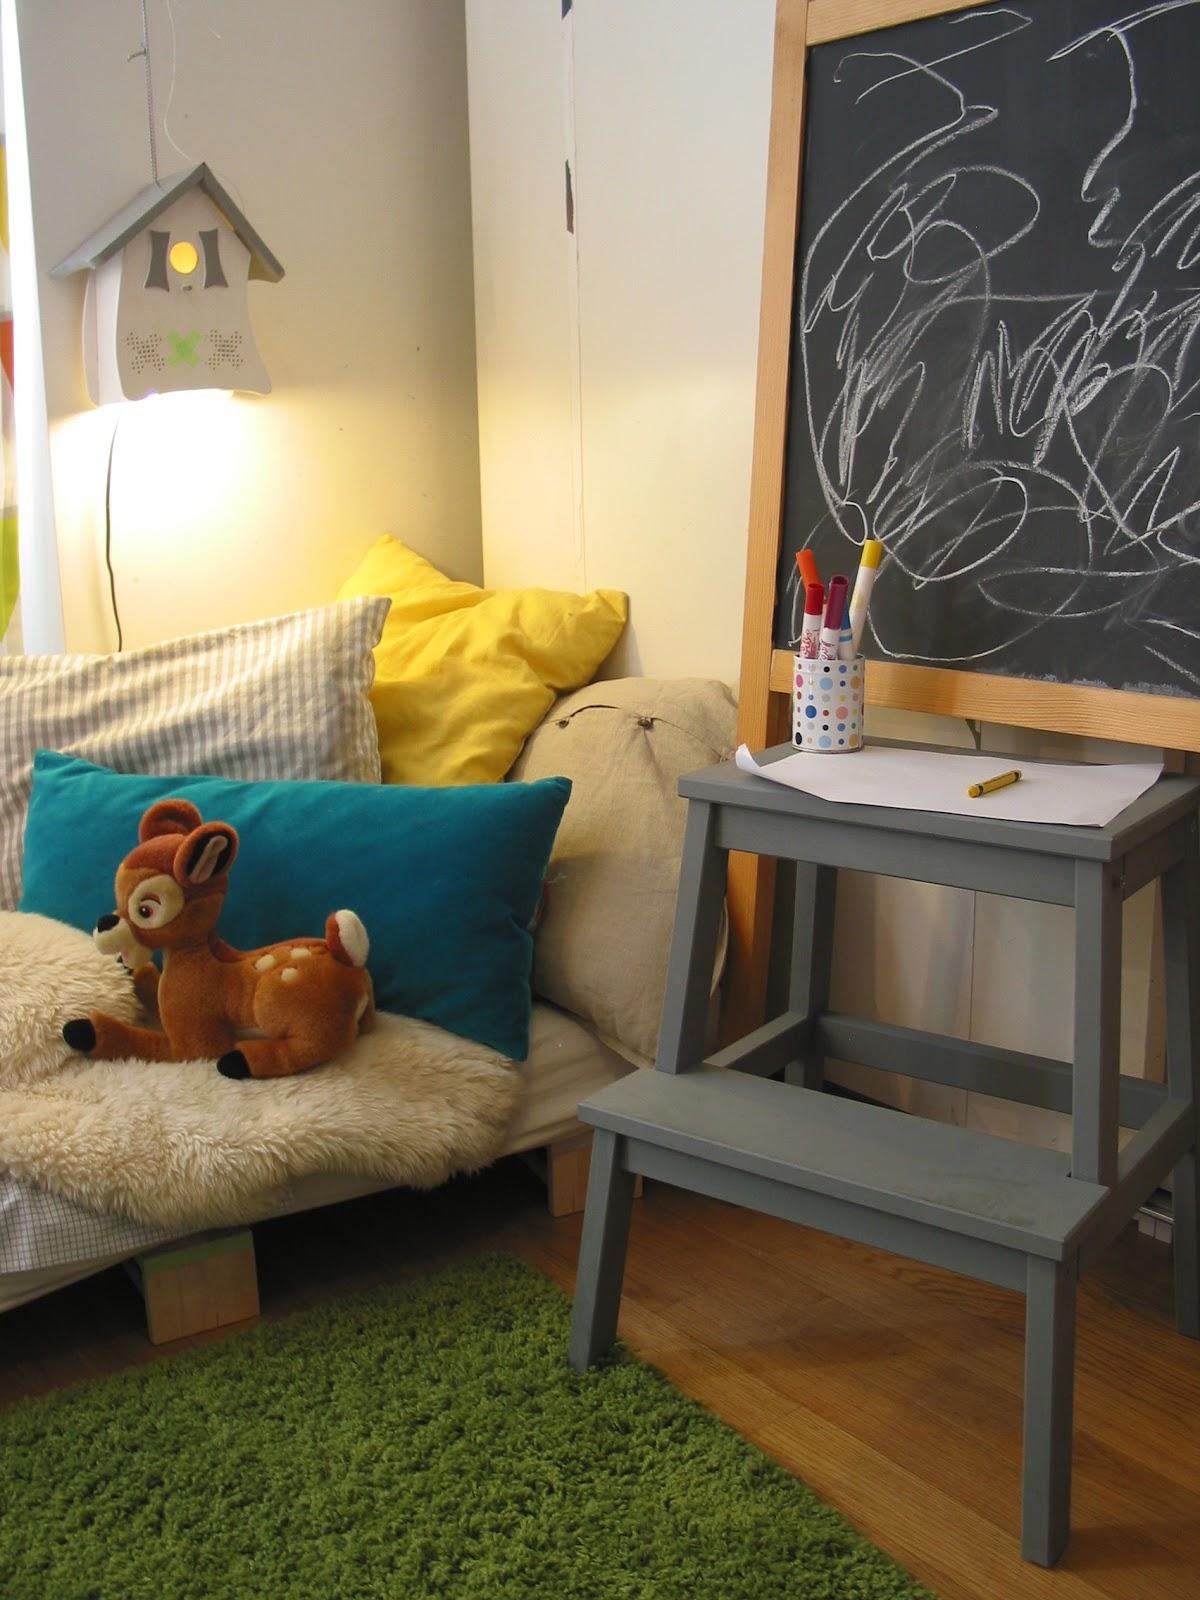 Tavolino Che Diventa Tavolo Ikea ikea bekvam hacks | mommo design | bloglovin'